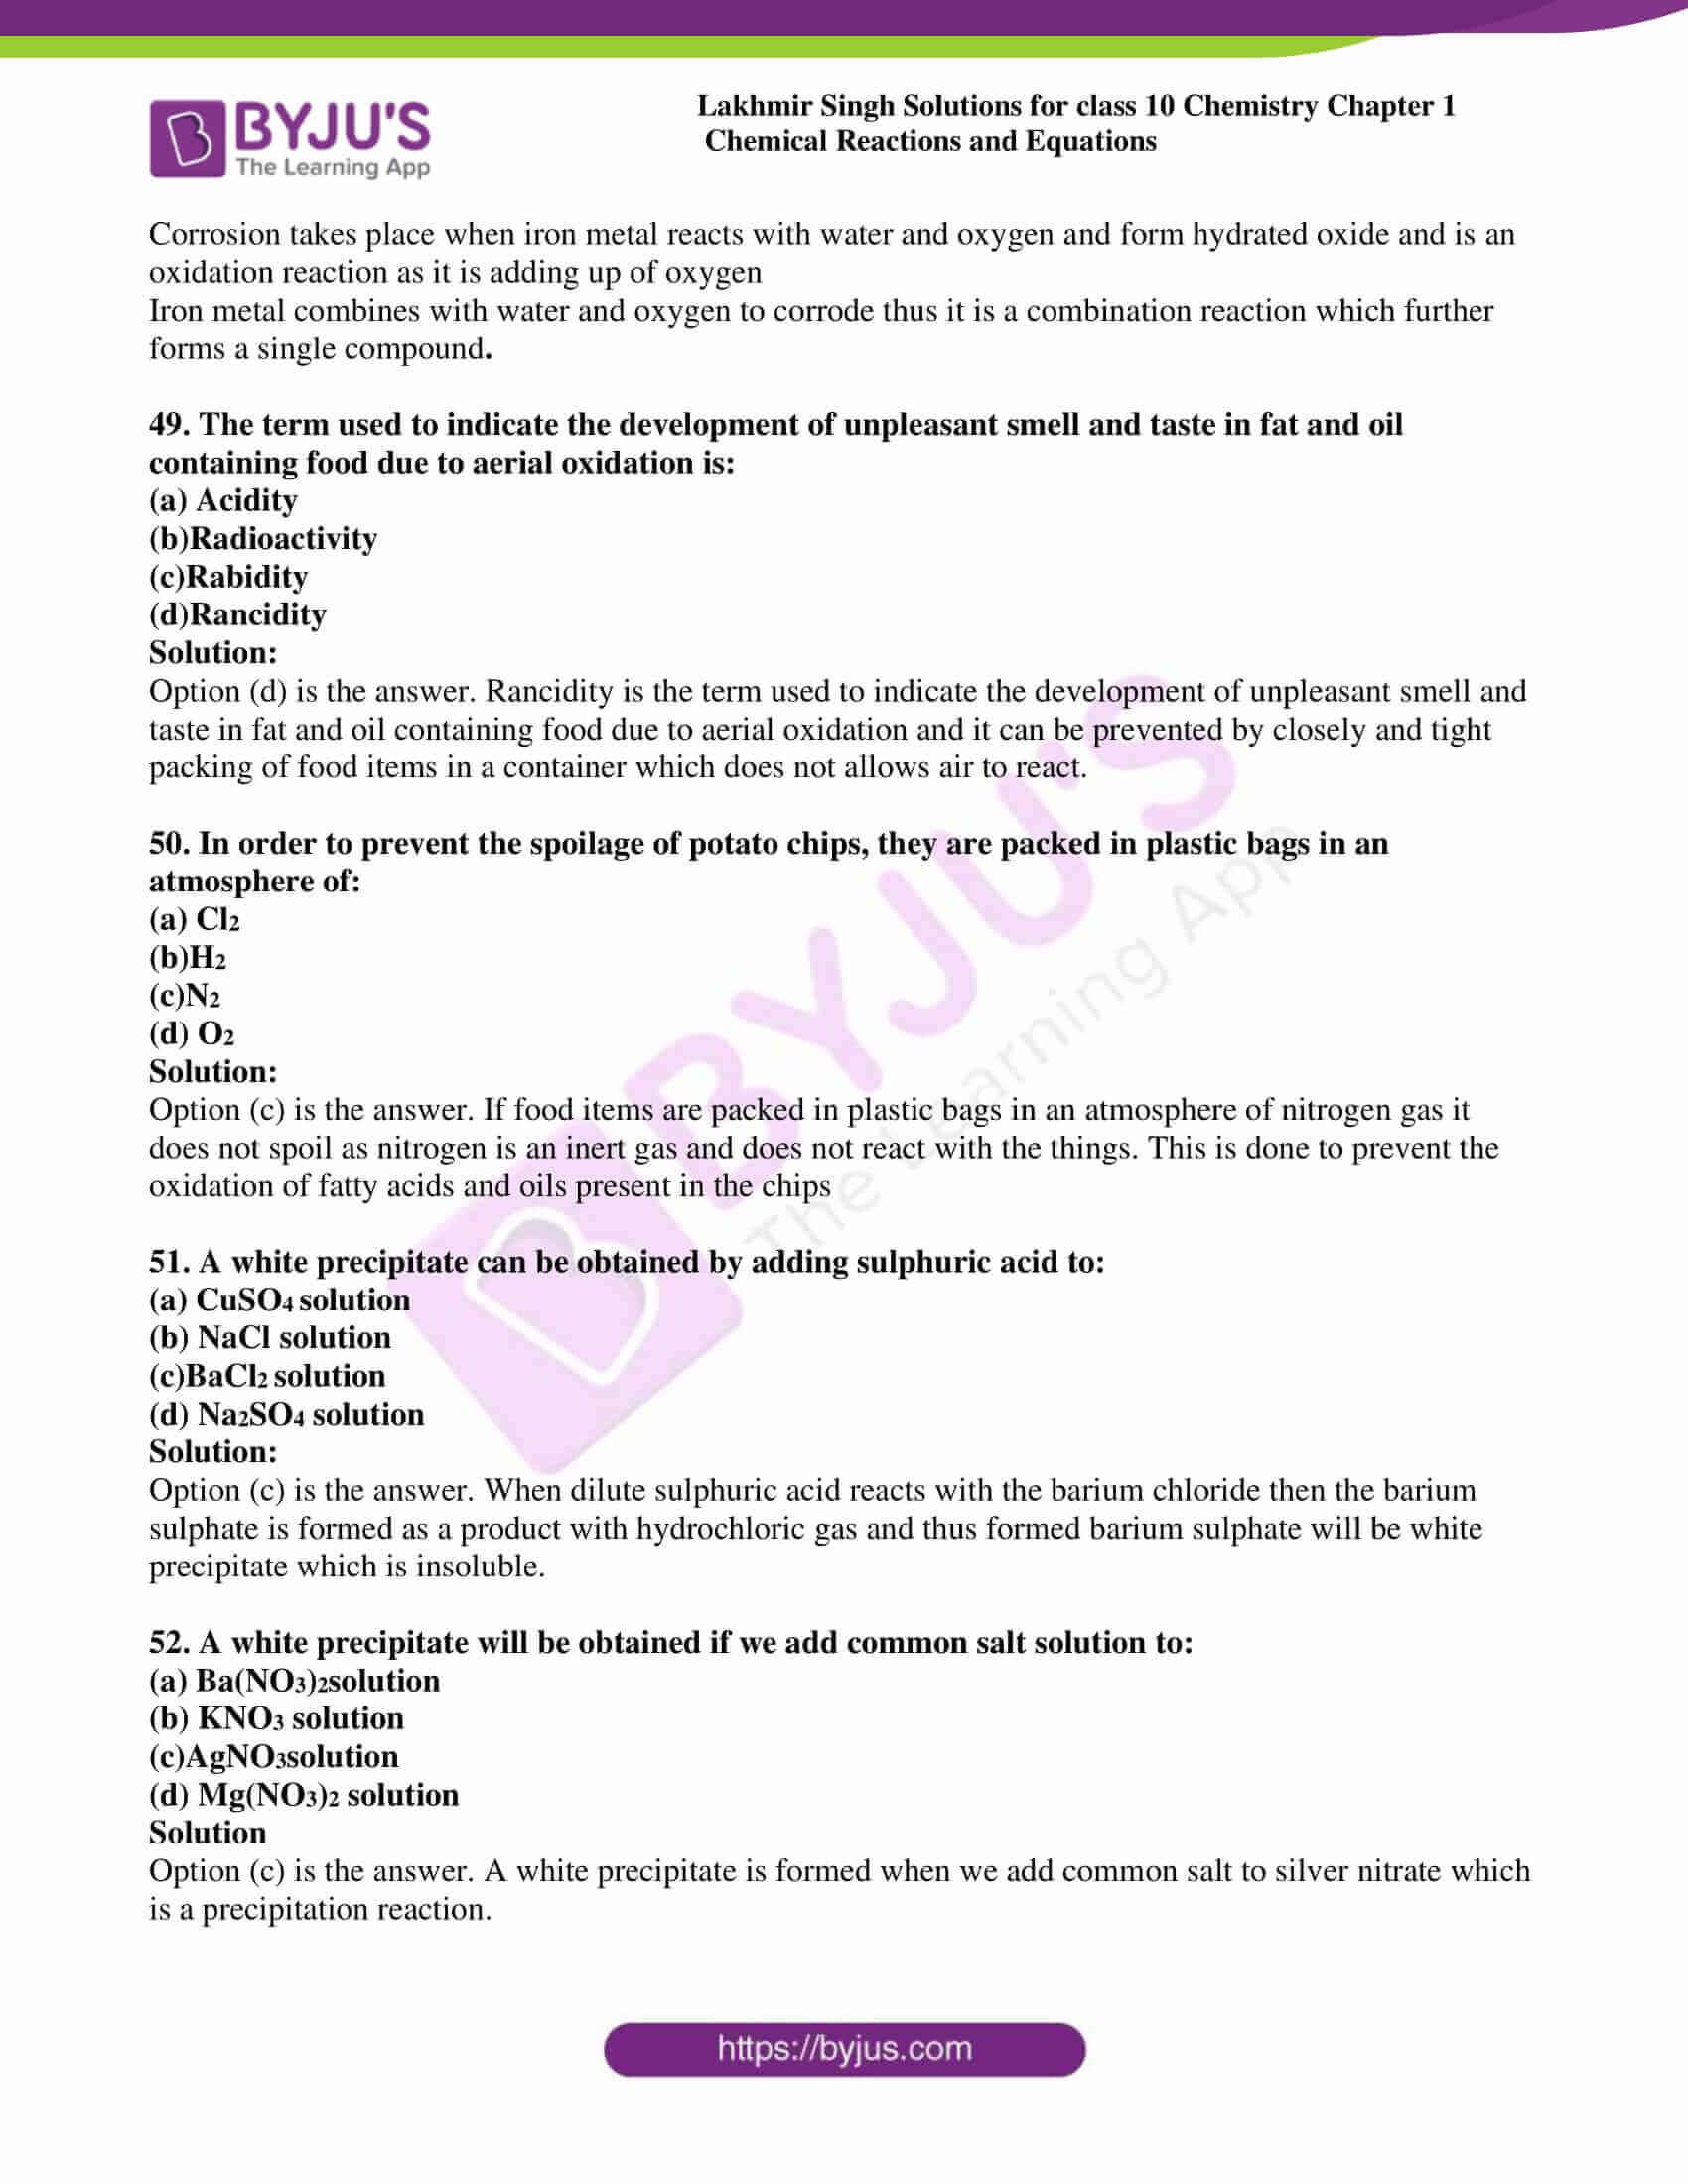 lakhmir singh sol class 10 che chapter 1 27